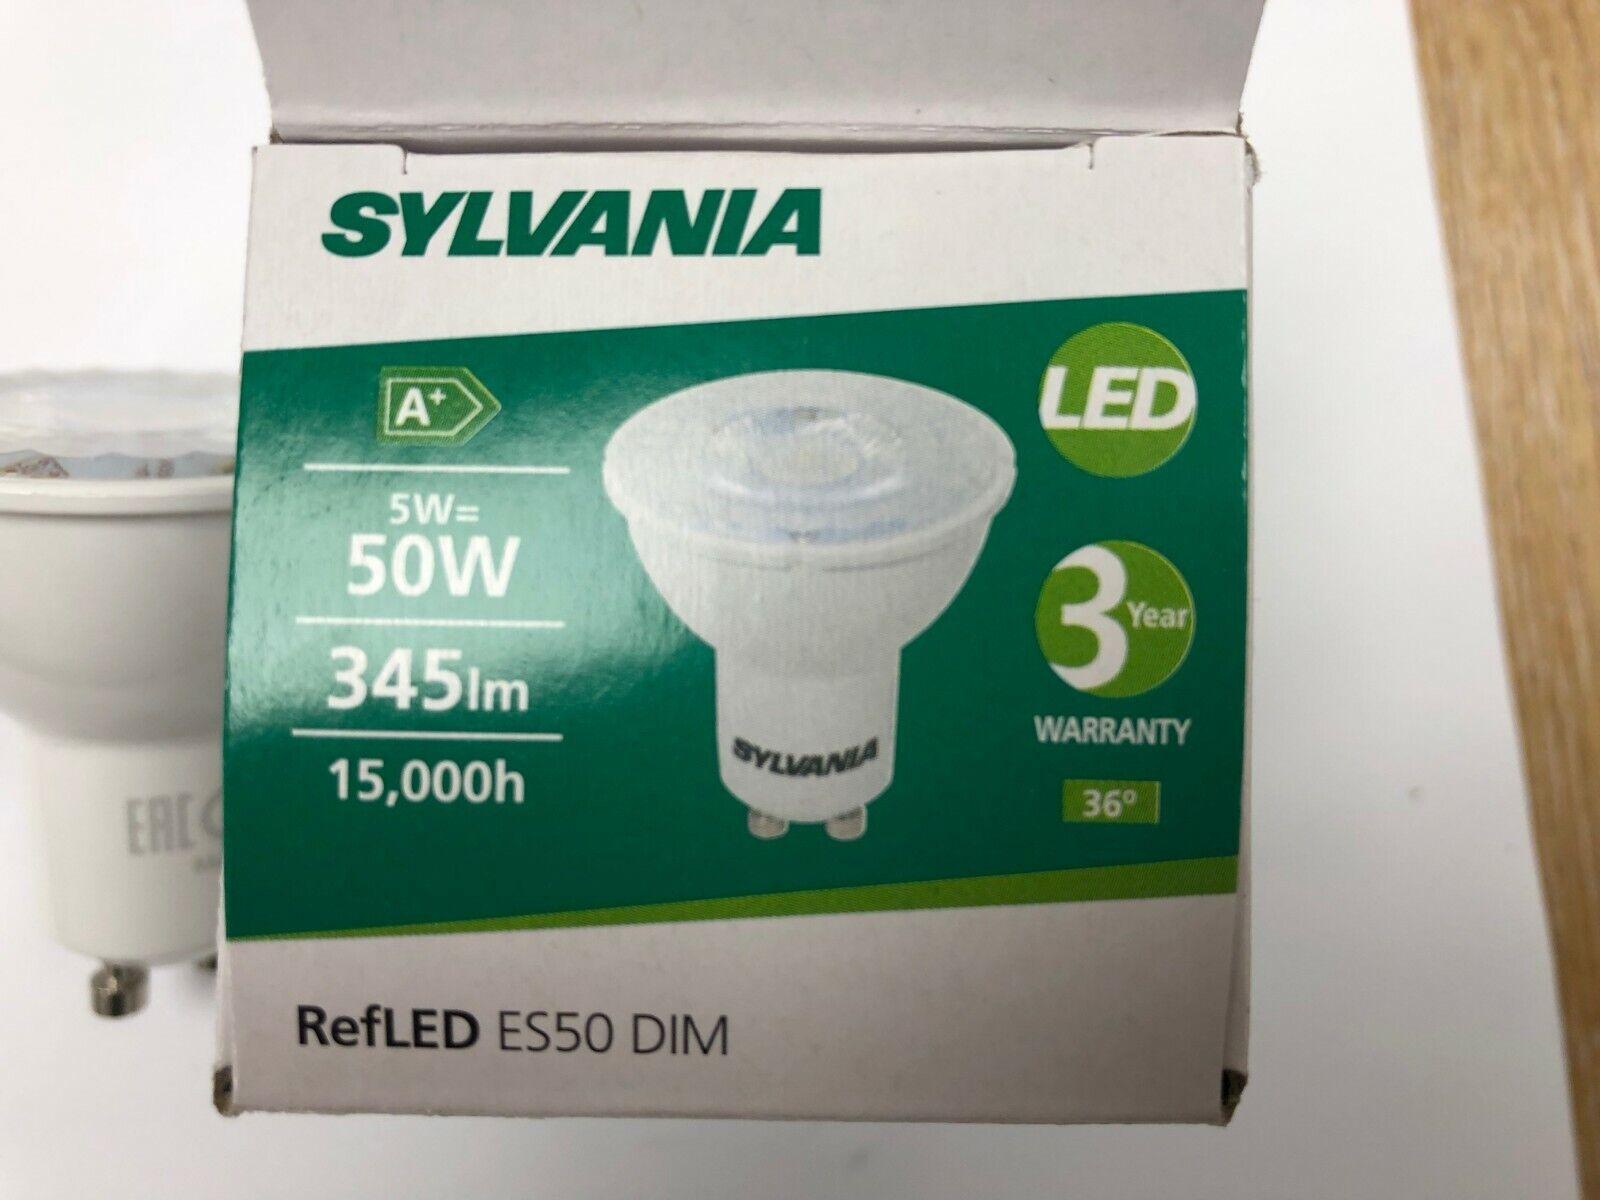 Envases de Sylvania LED GU10 5W Luz 5 vatios 345lm = 50W Bombilla Regulable